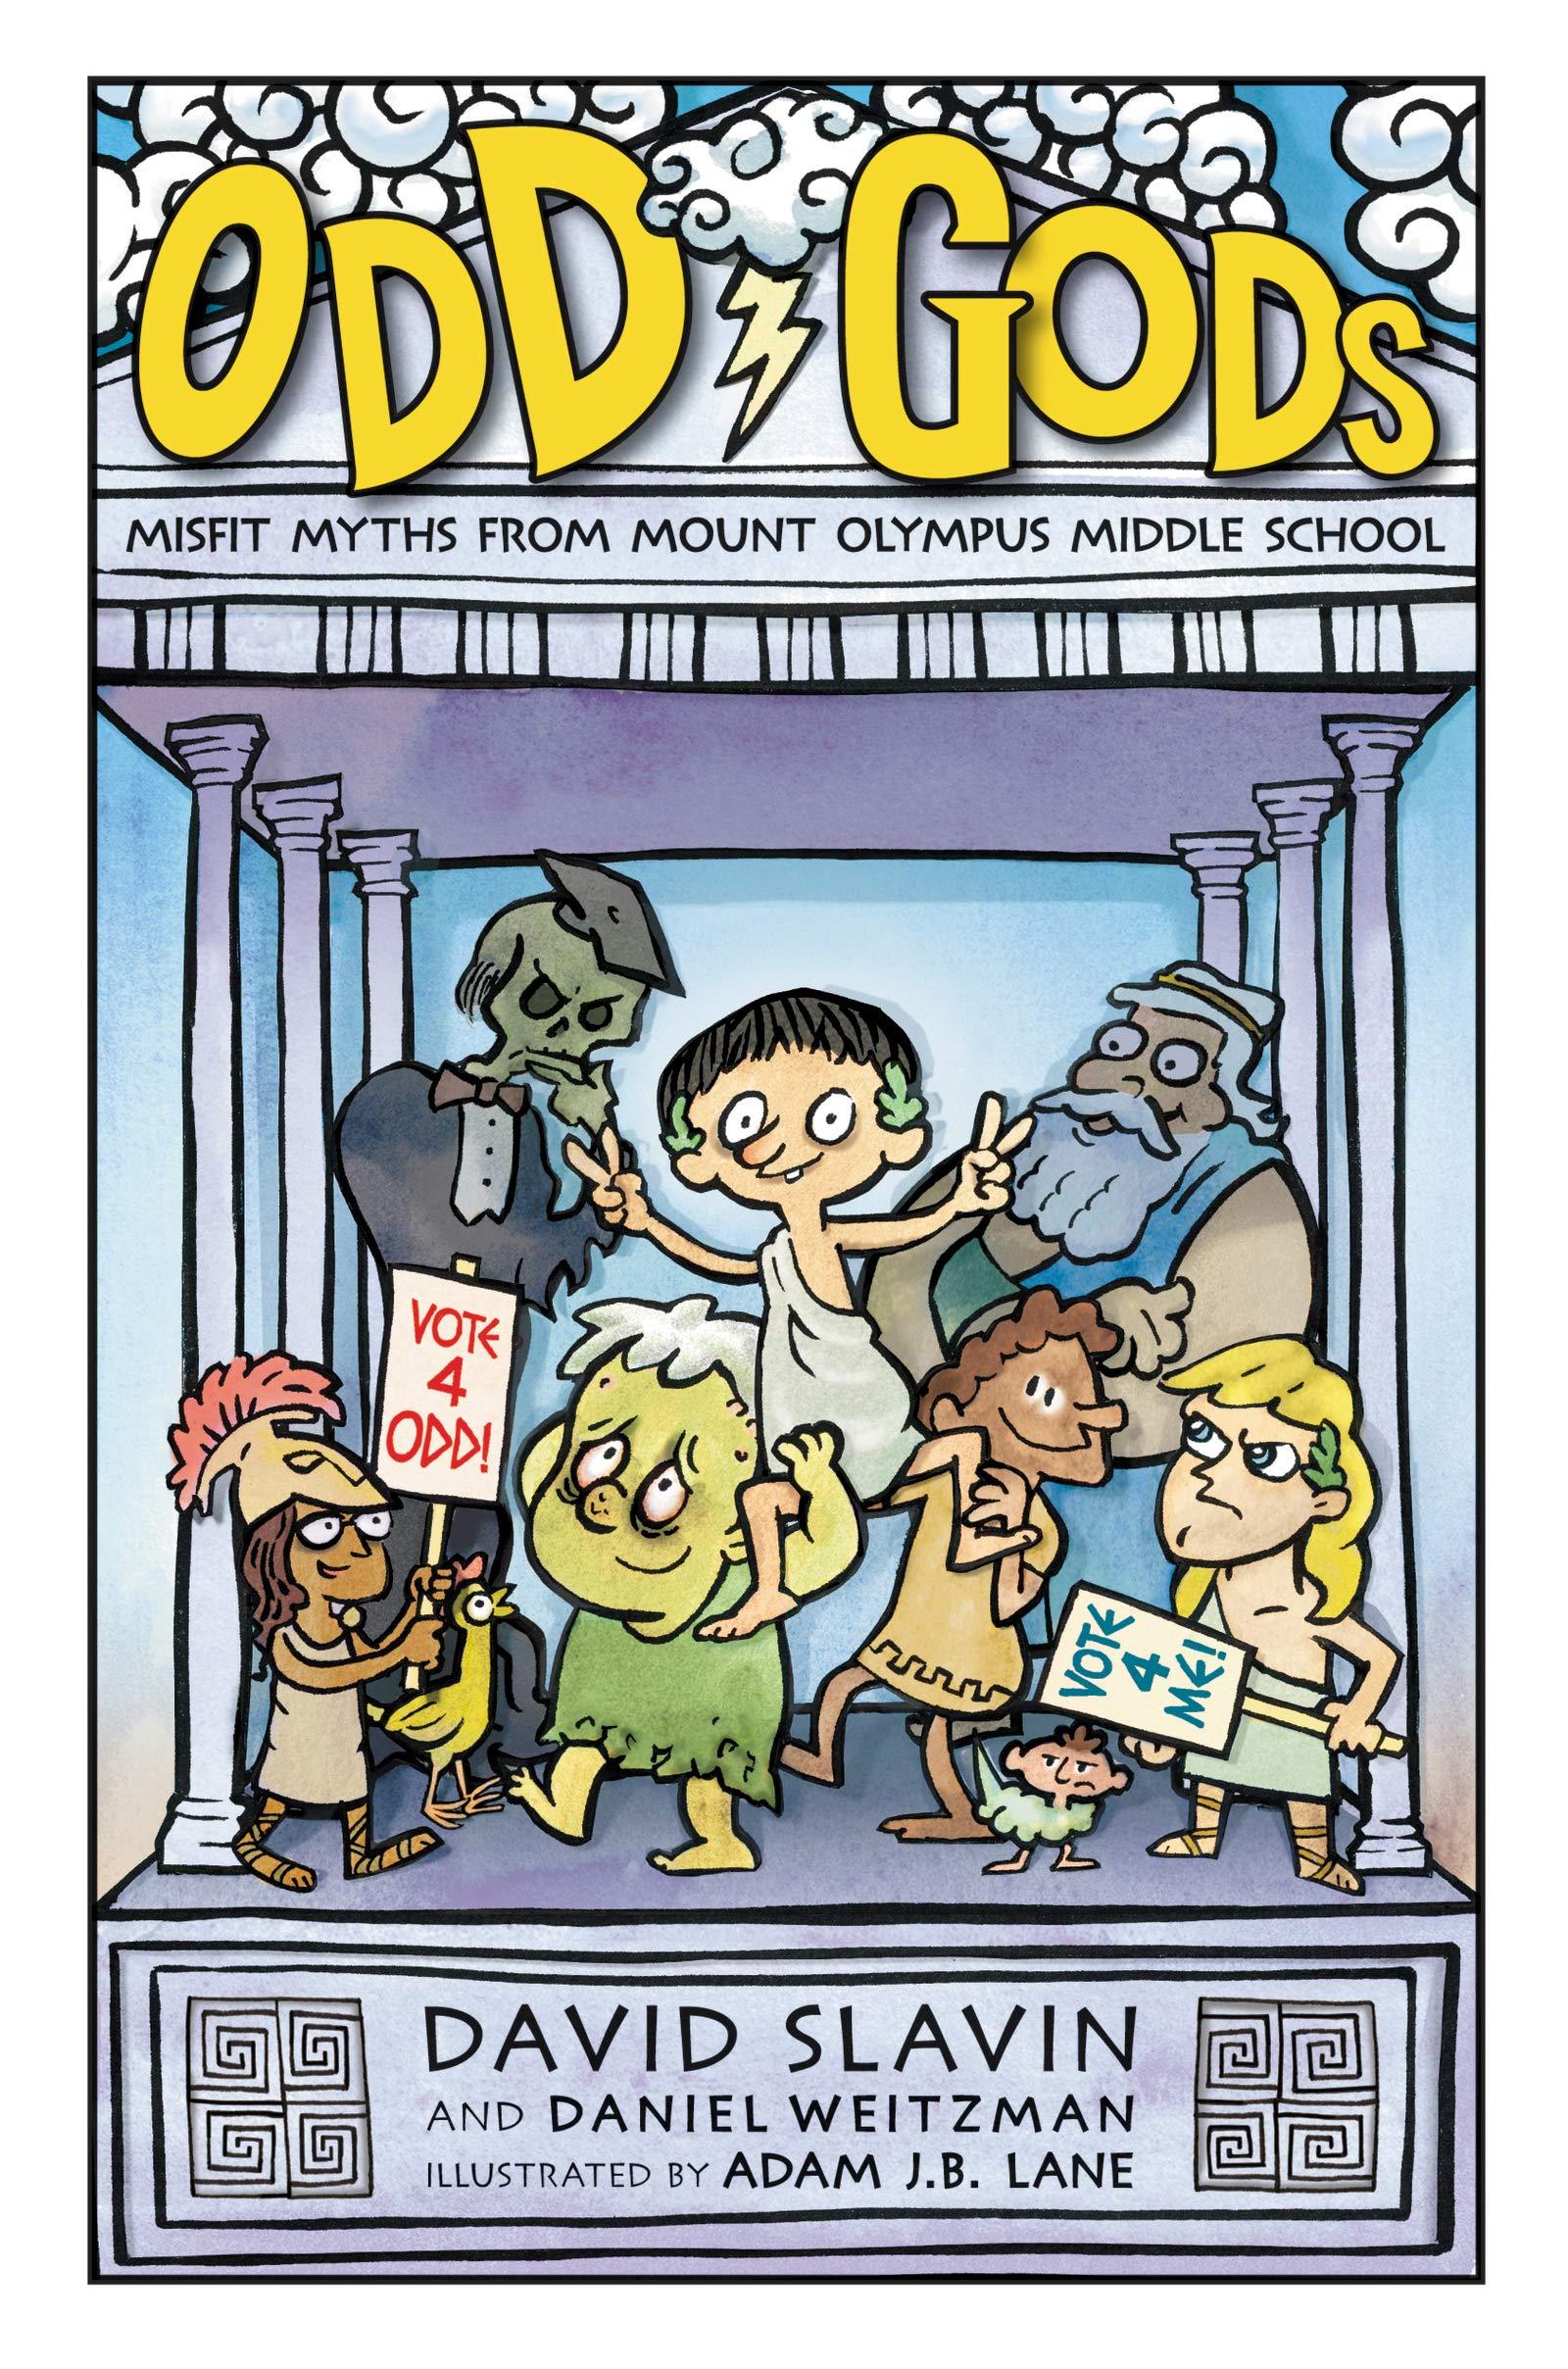 Odd Gods (Odd Gods, 1): Slavin, David, Weitzman, Daniel, Lane, Adam J.B.:  9780062839534: Amazon.com: Books